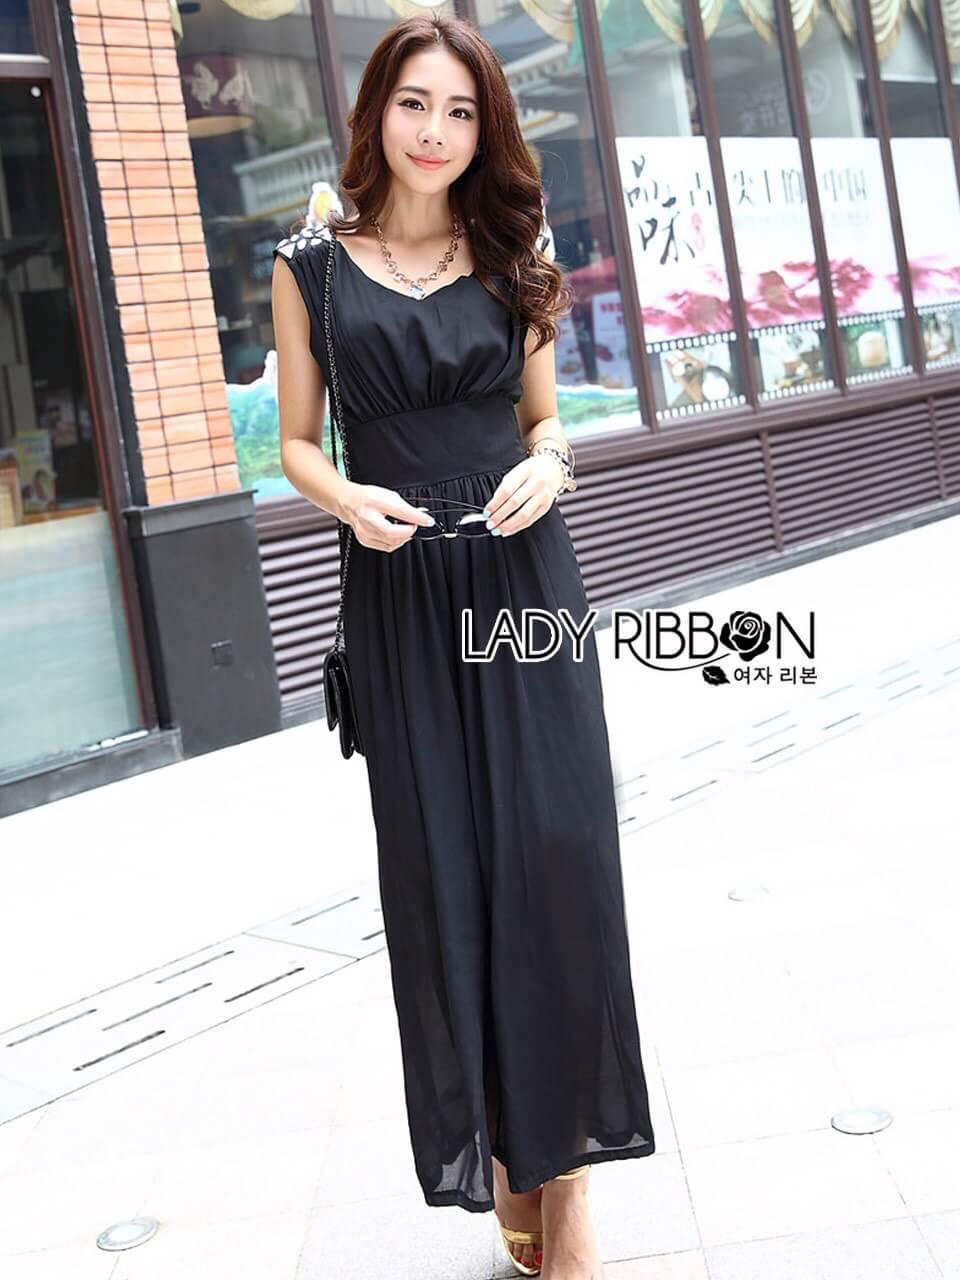 &#x1F380 Lady Ribbon's Made &#x1F380 Lady Erin Sweet Classy Embellished Maxi Dress